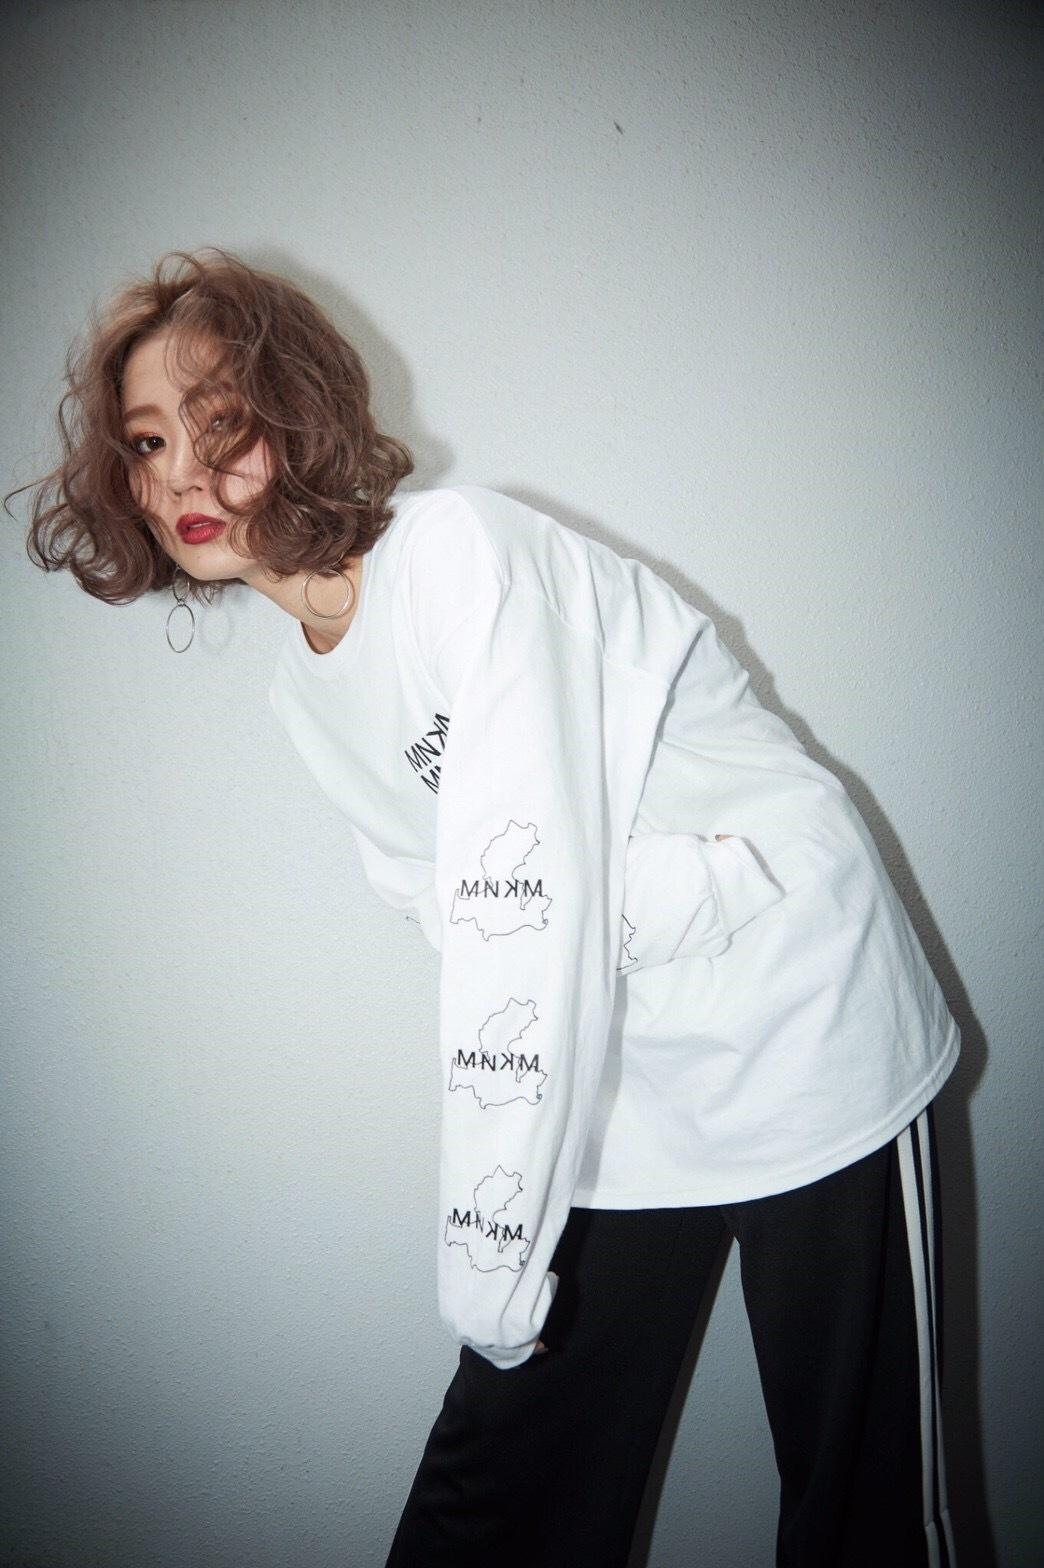 【UNISEX】Standard MNKM Long sleeves